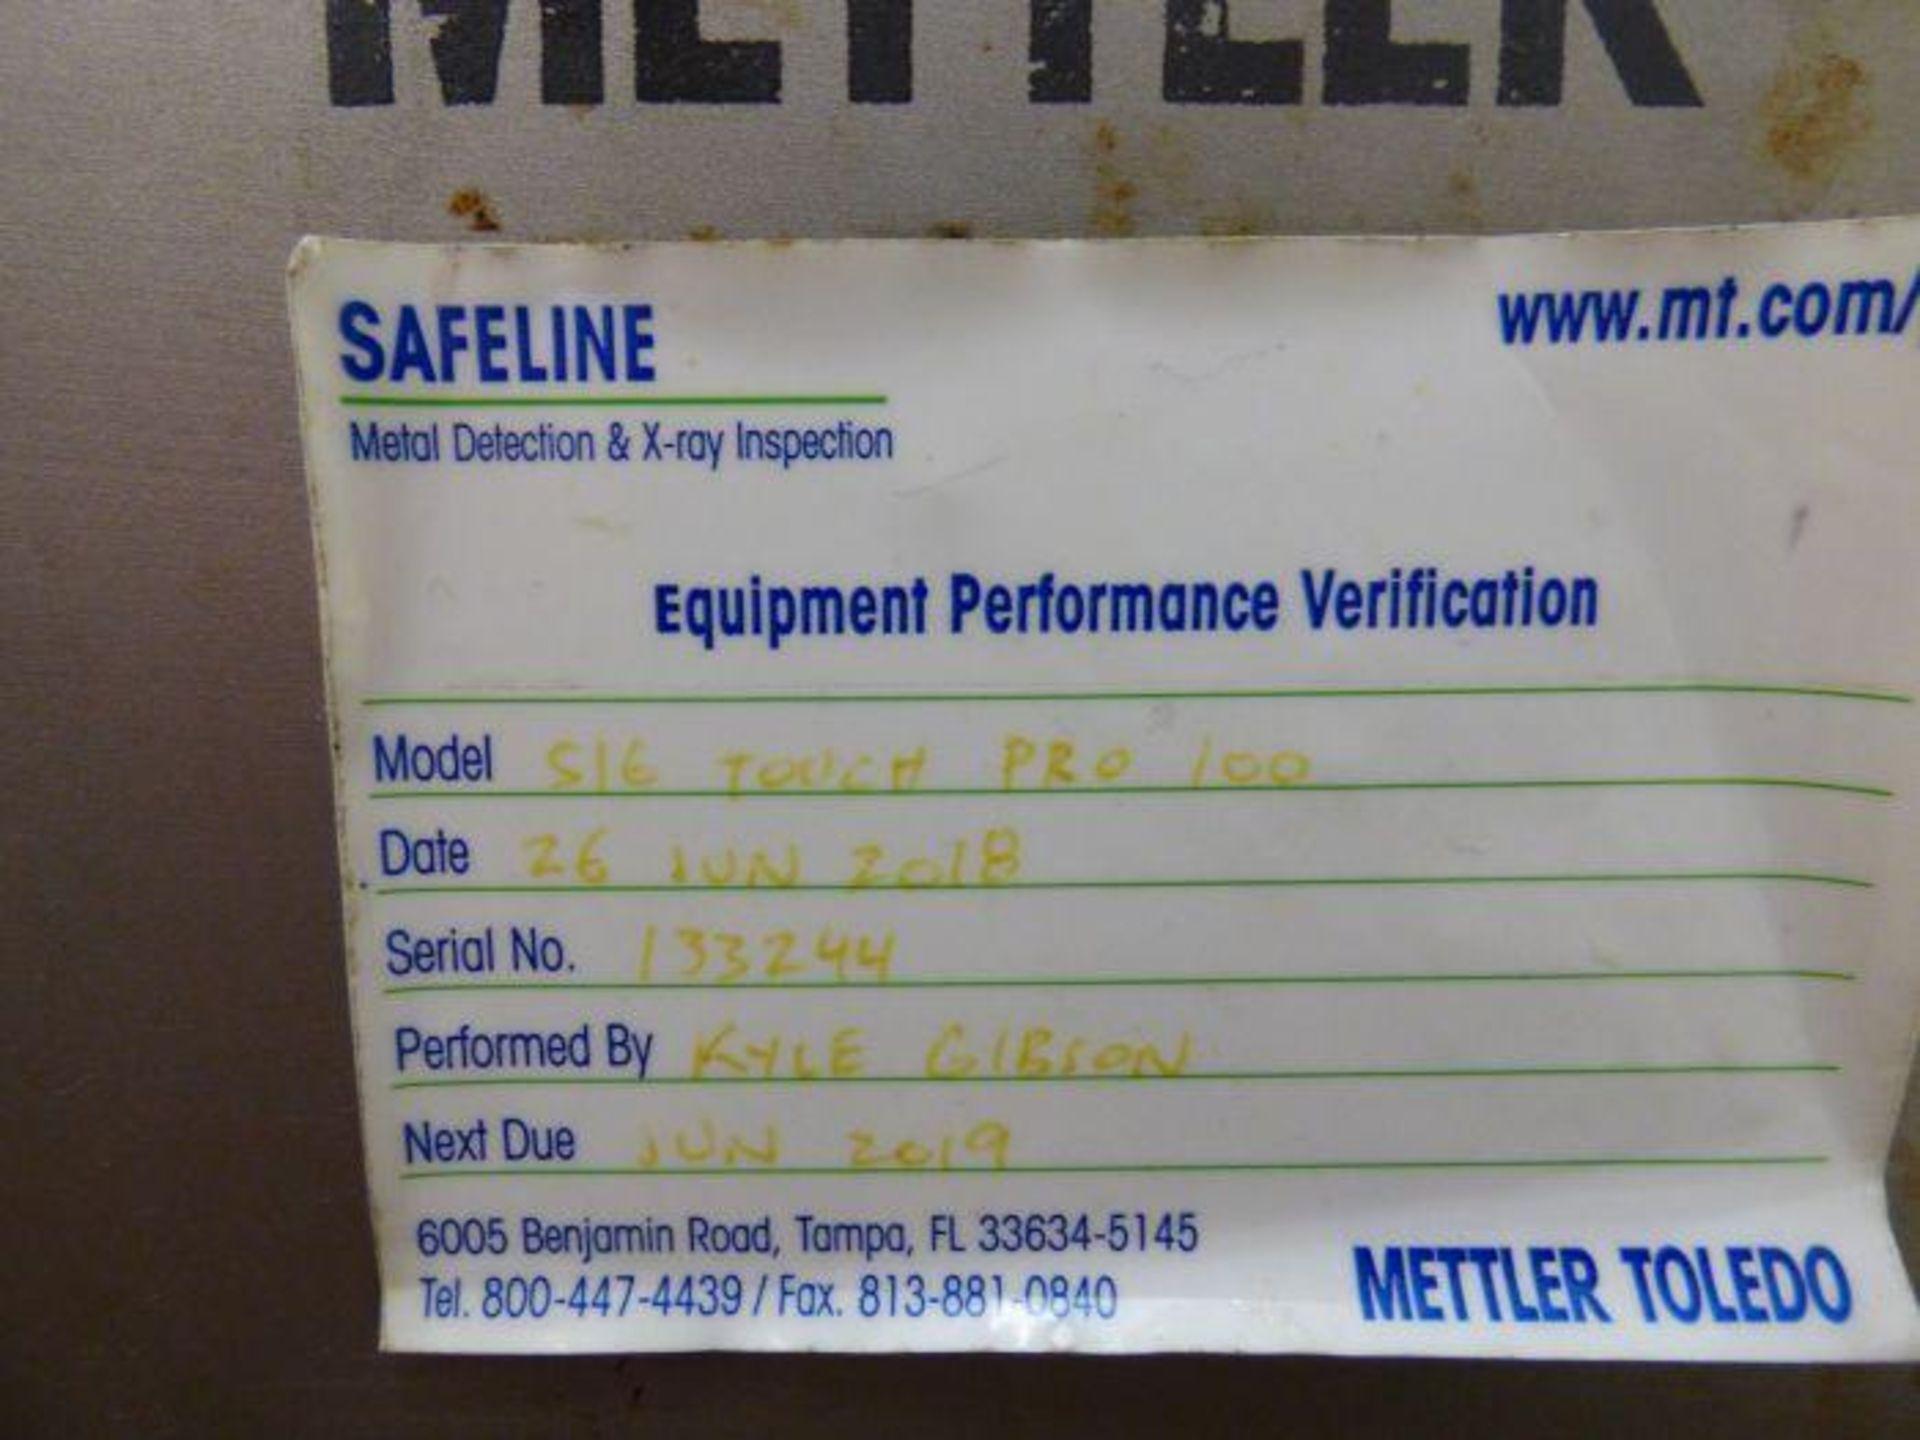 Lot 1115 - 2018 Mettler Toledo Stainless Steel Integrated In-Line Metal Detector